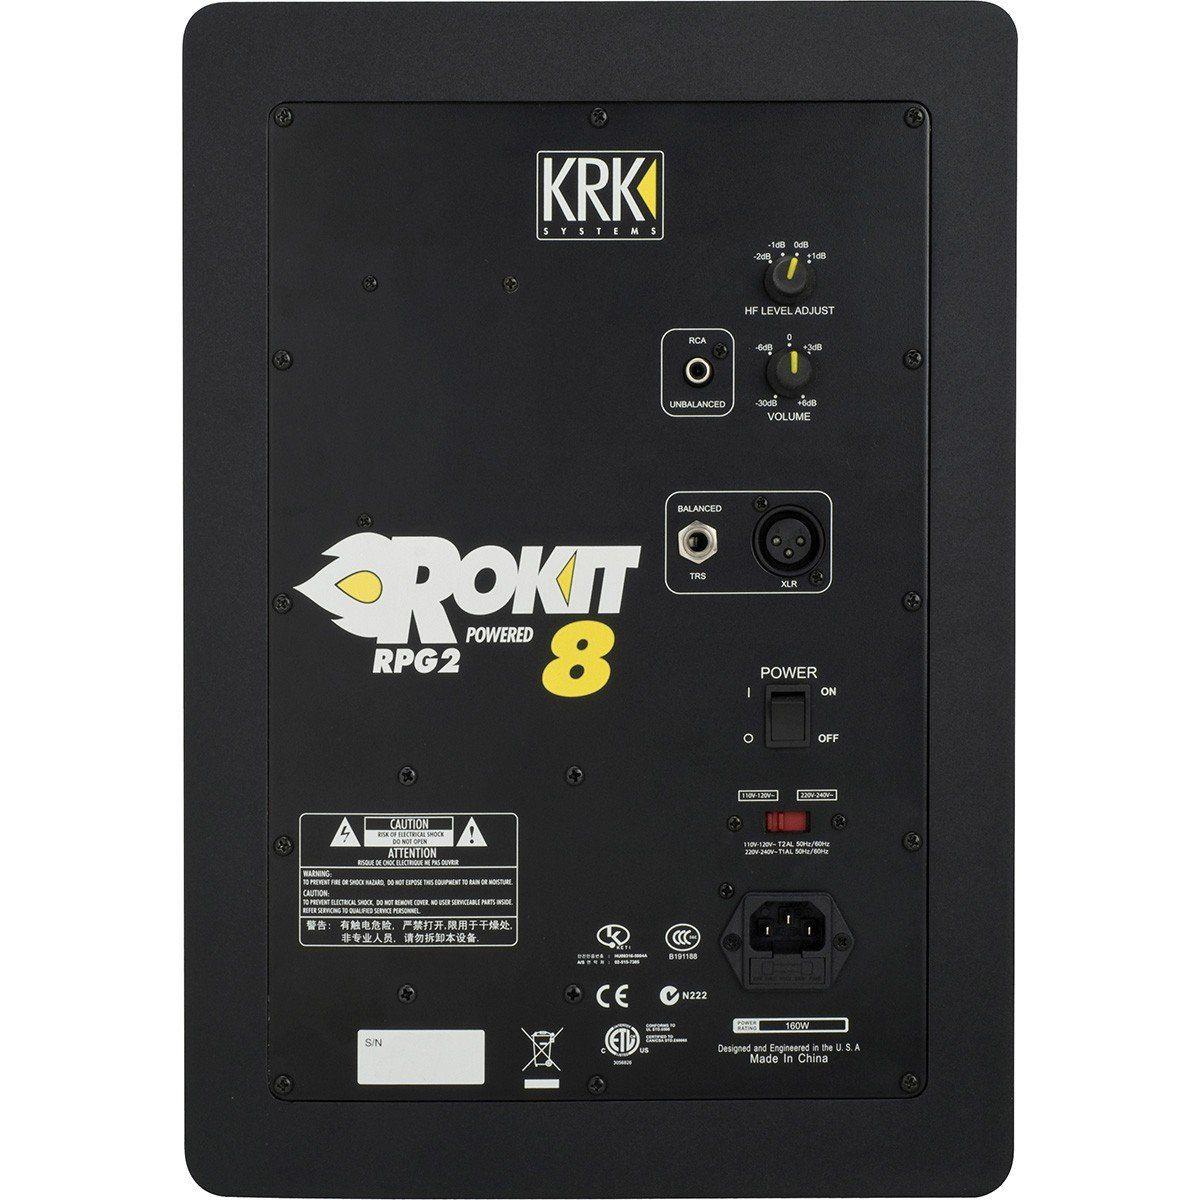 Usado - KRK RP8 G2 Rokit Powered Monitor de Áudio de Referencia para Estúdio